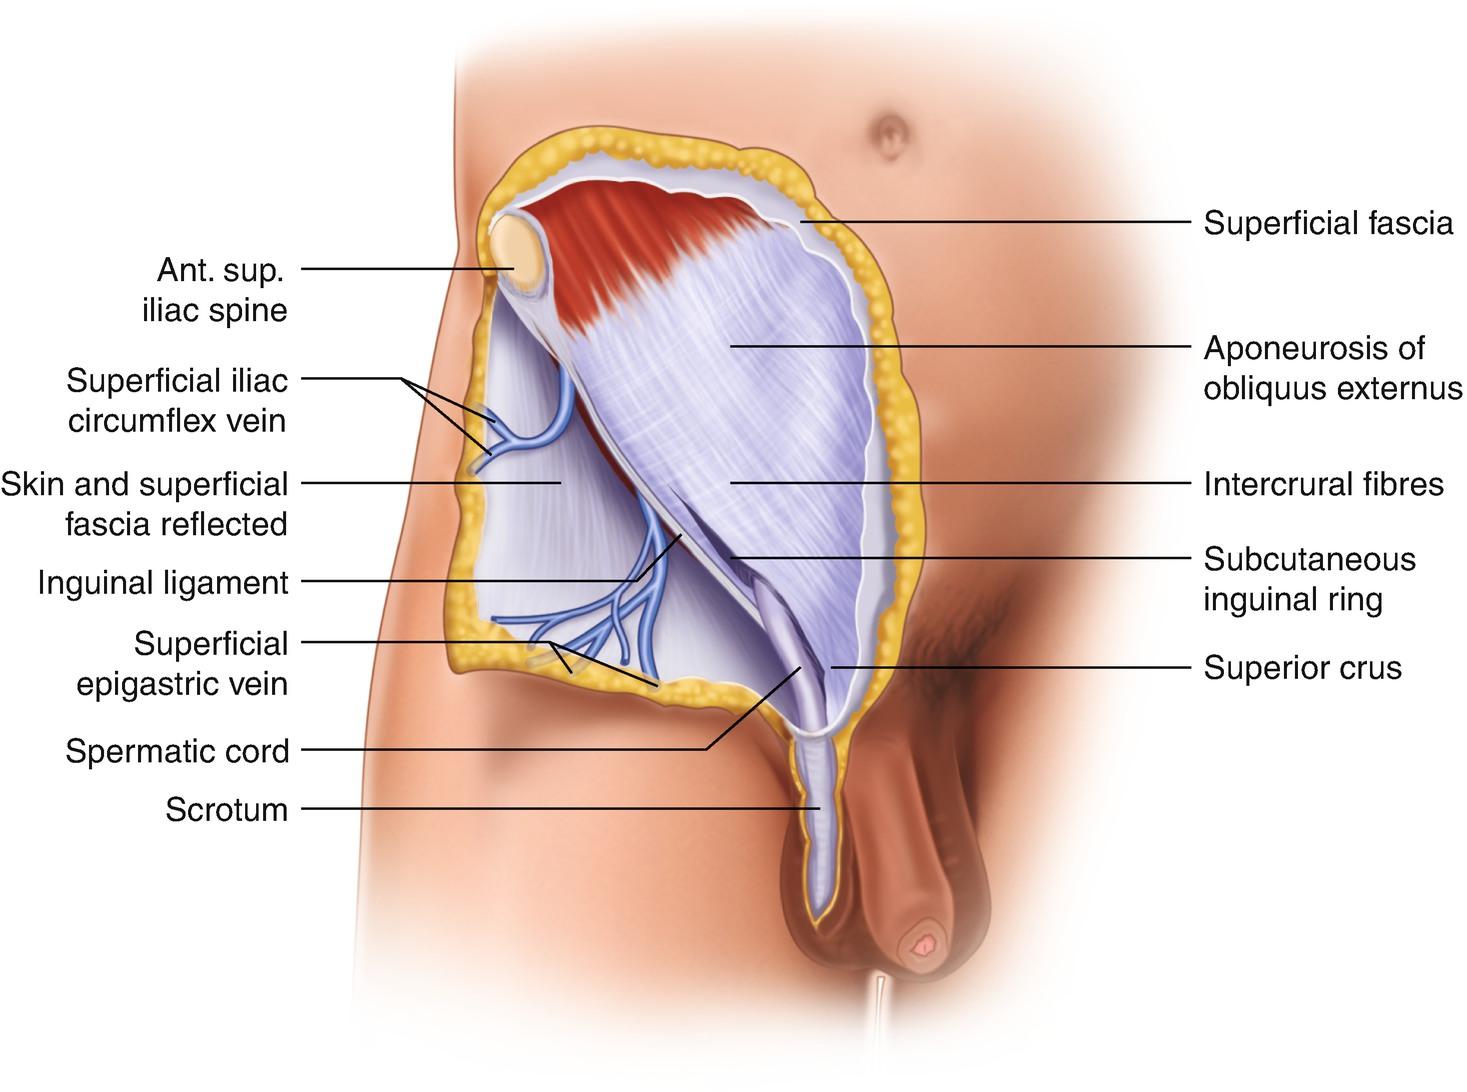 Anatomy Of The Inguinal Region Springerlink